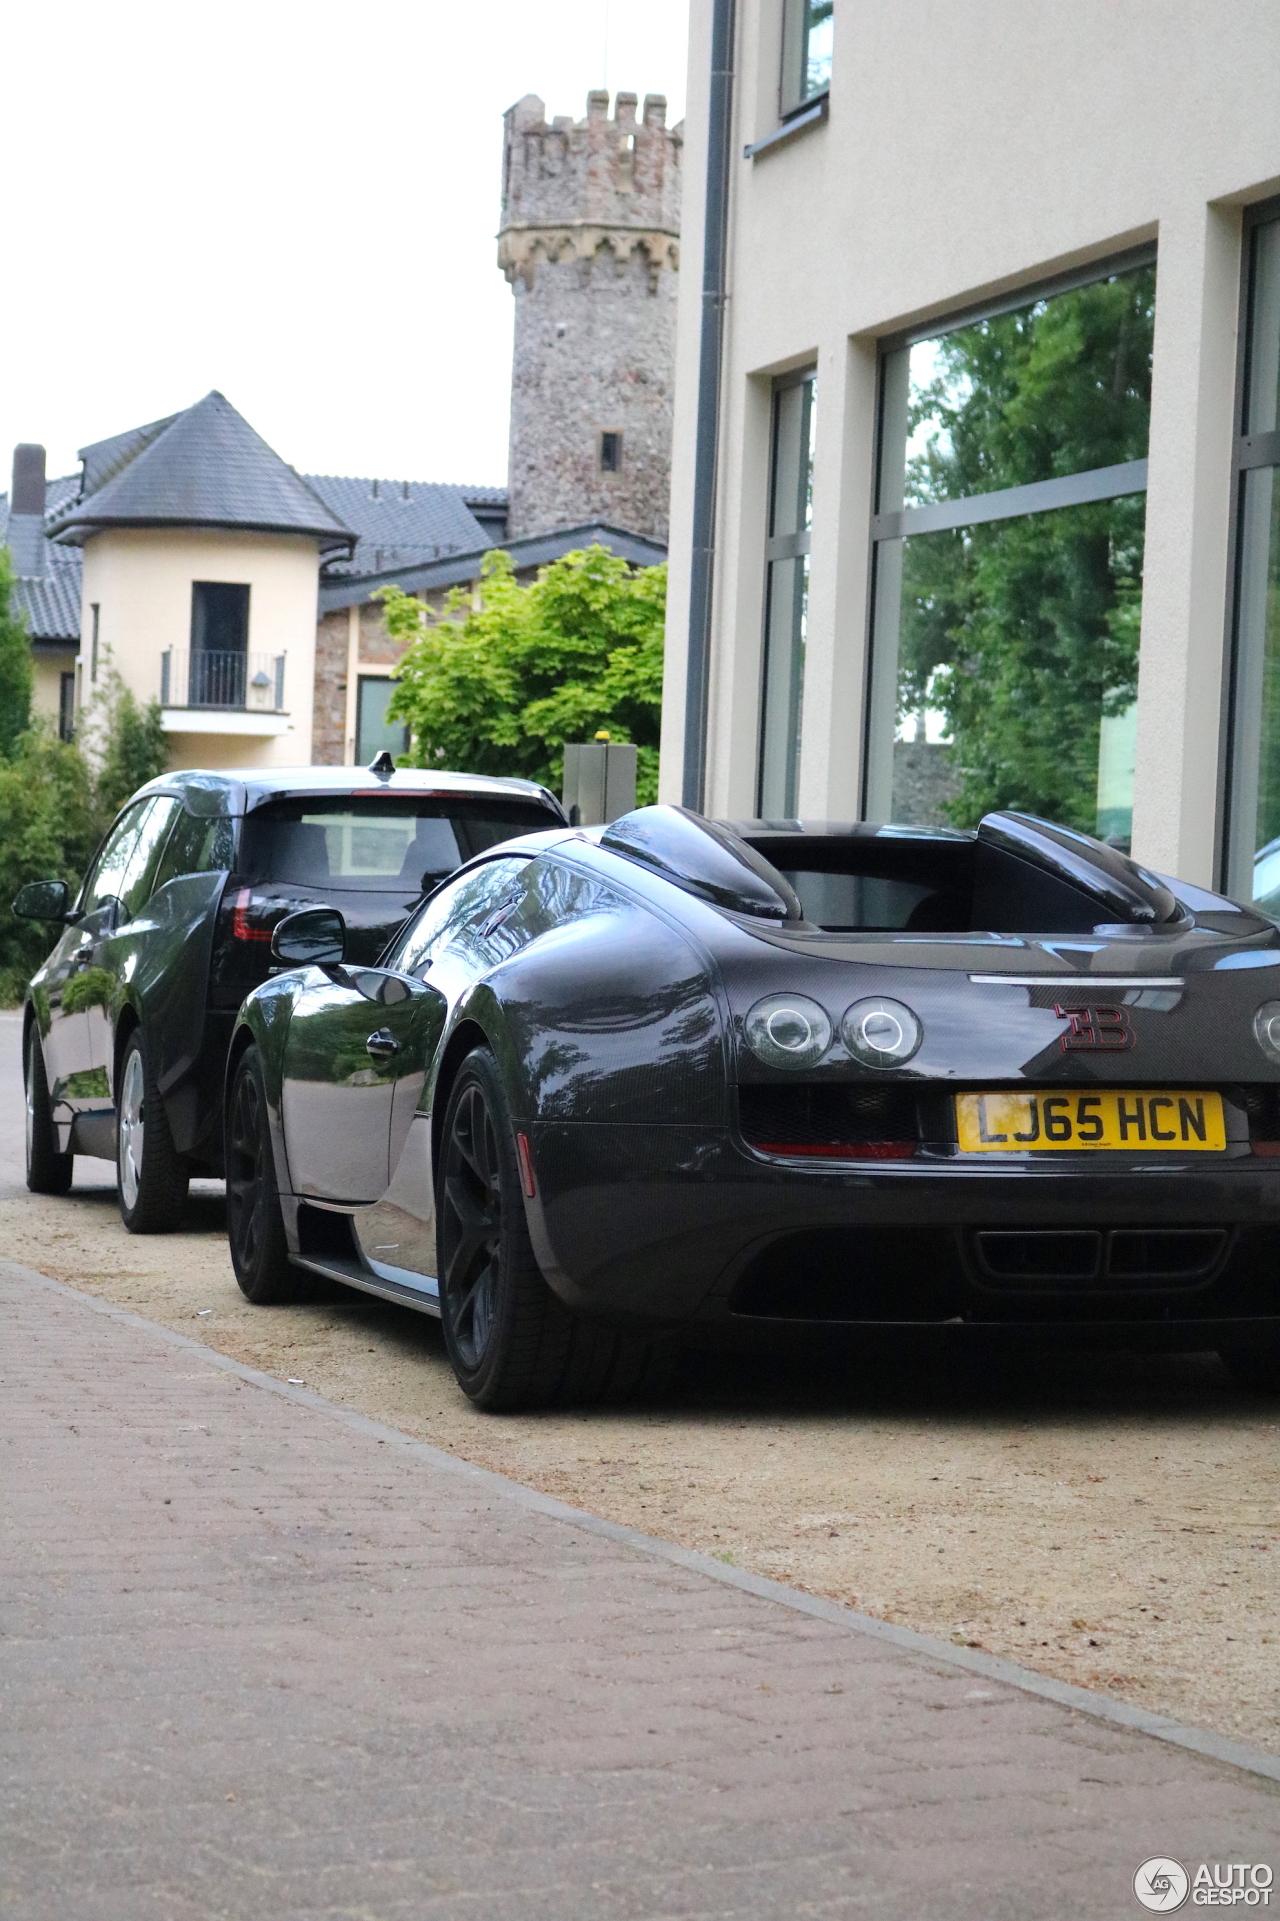 bugatti-veyron-164-grand-sport-vitesse-c456831072017184806_6 Stunning Bugatti Veyron Price In Brazil Cars Trend